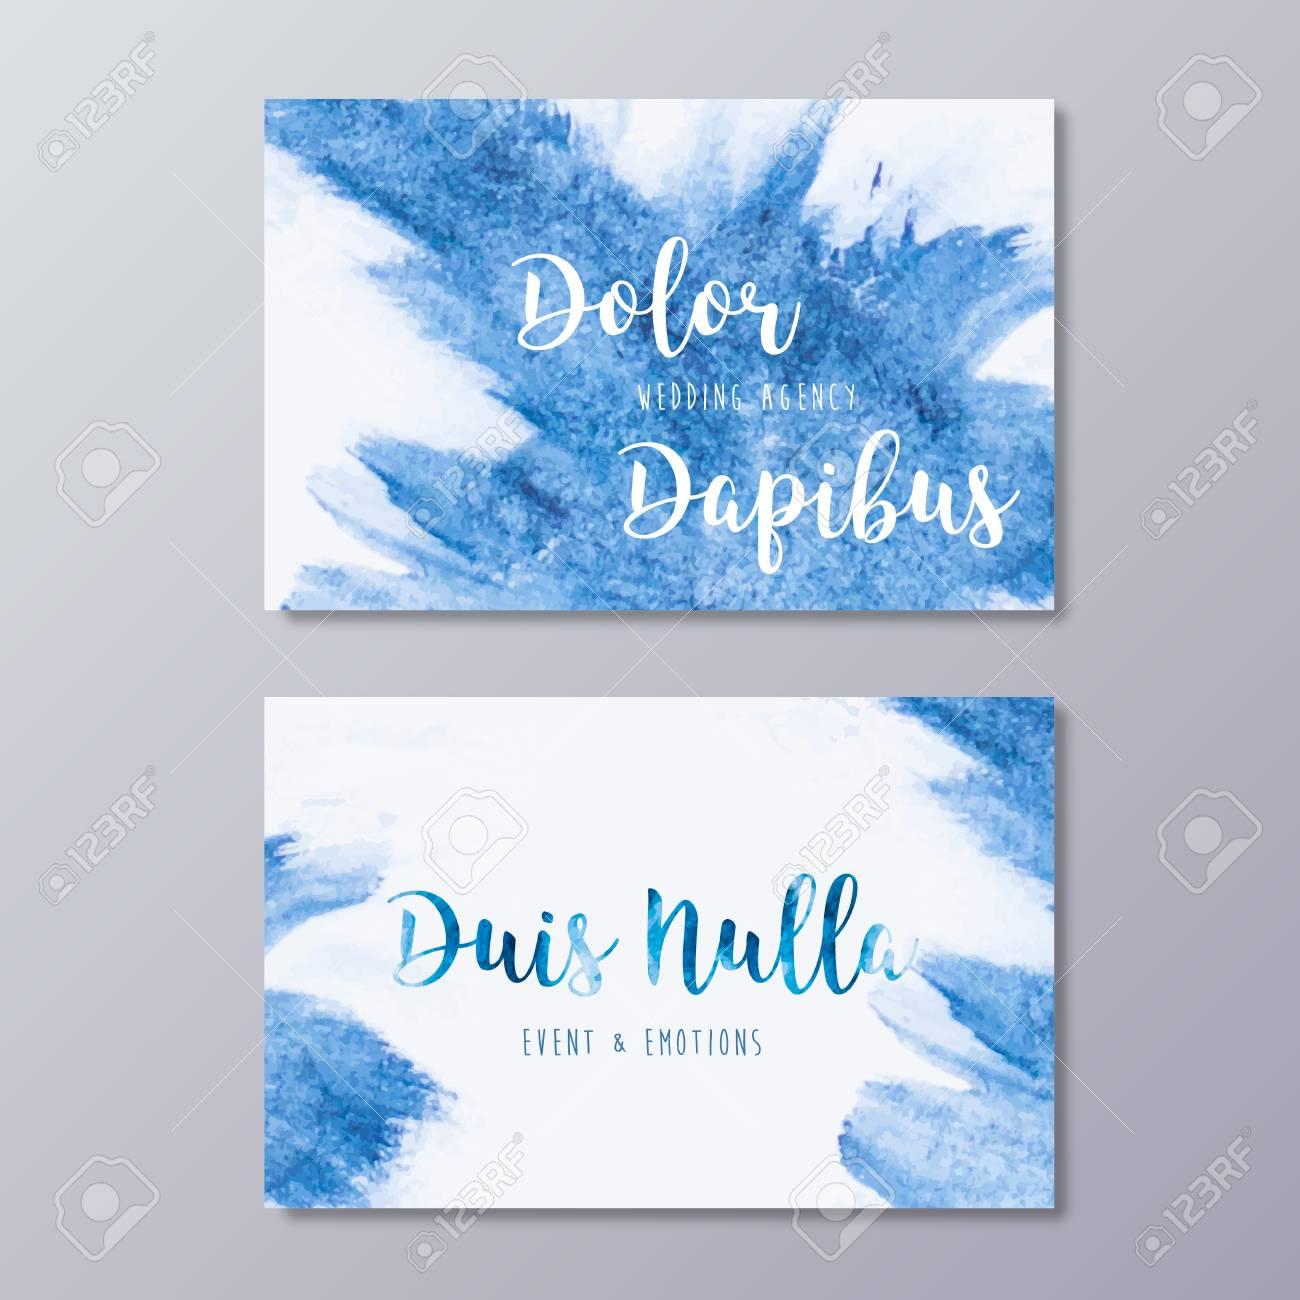 Premade Wedding Agency Business Card Design Templates. Hand Drawn ...